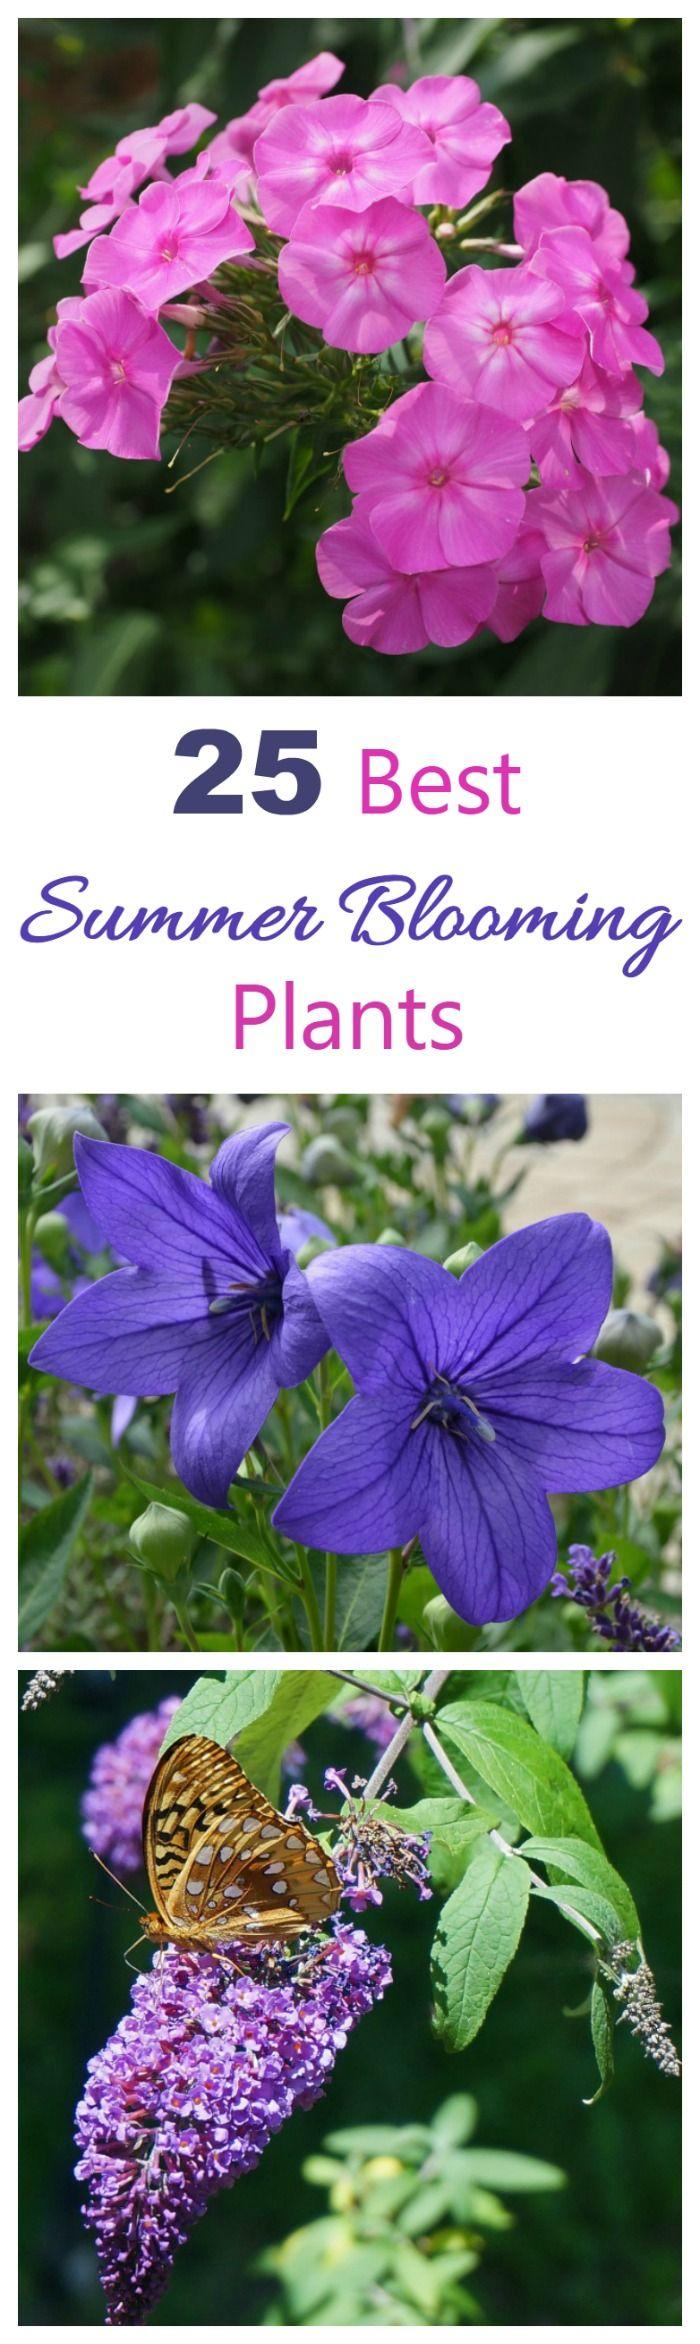 Summer Blooming Plants – 25 Favorites for Long Season Color